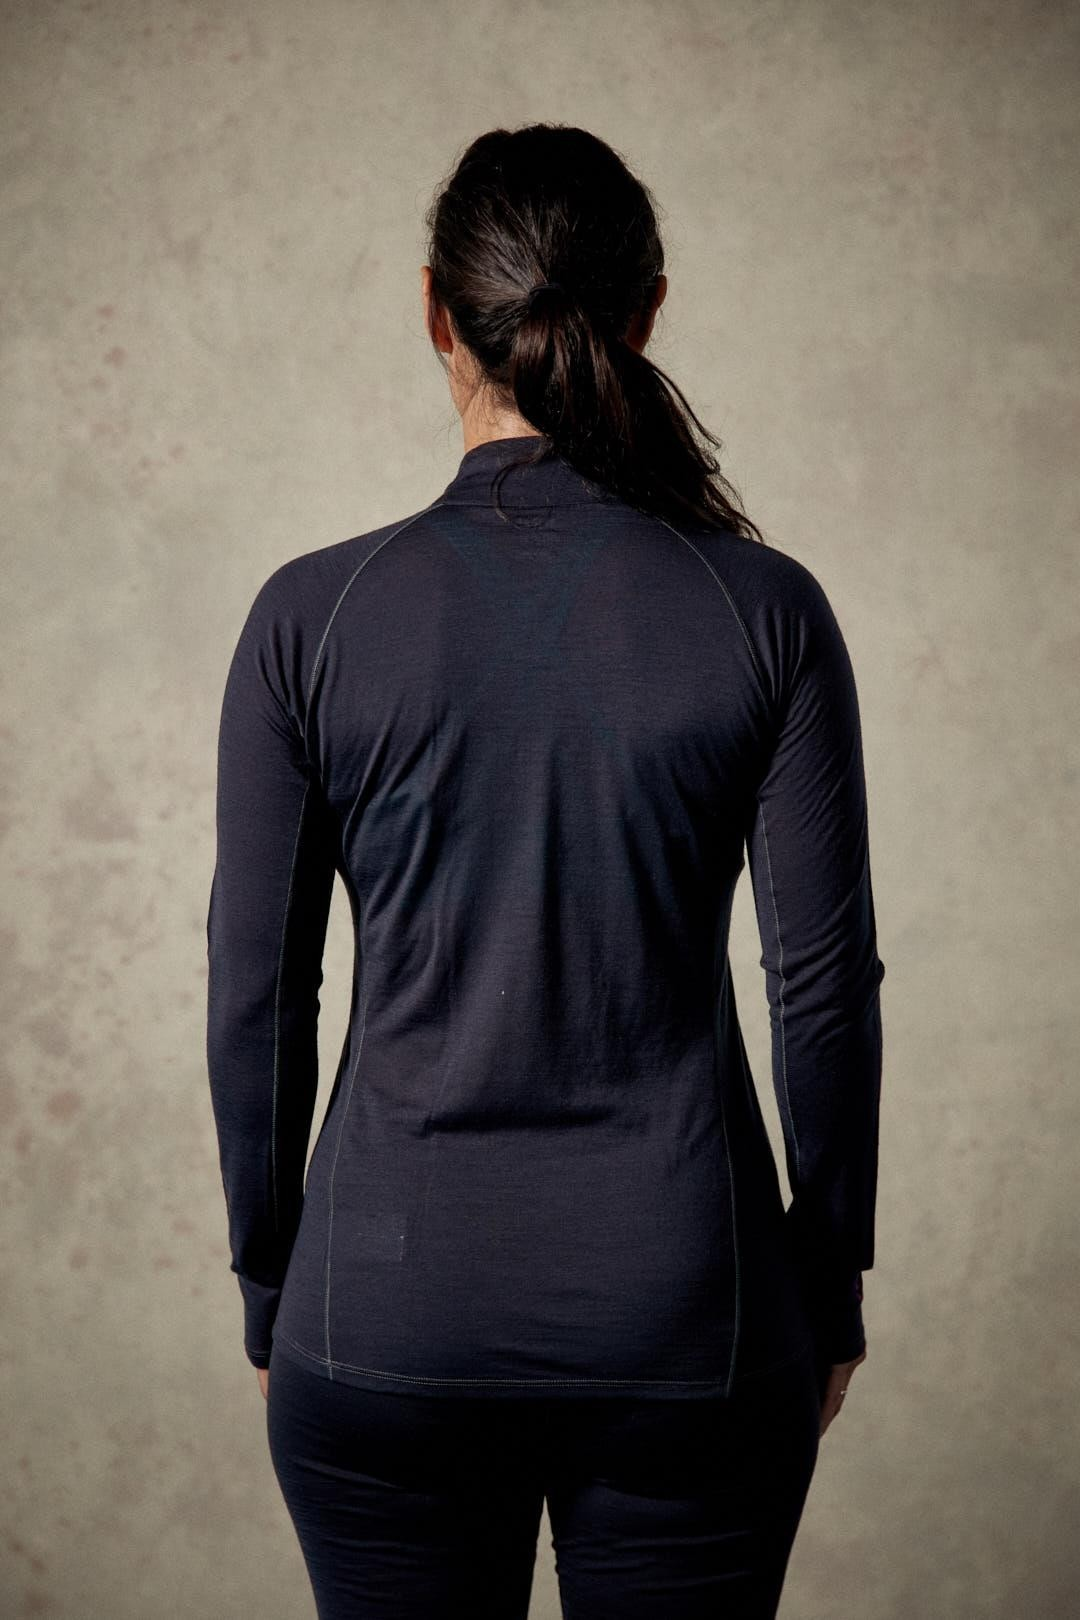 Rab Women's Merino 120 Long Sleeve Zip Tee - Ebony